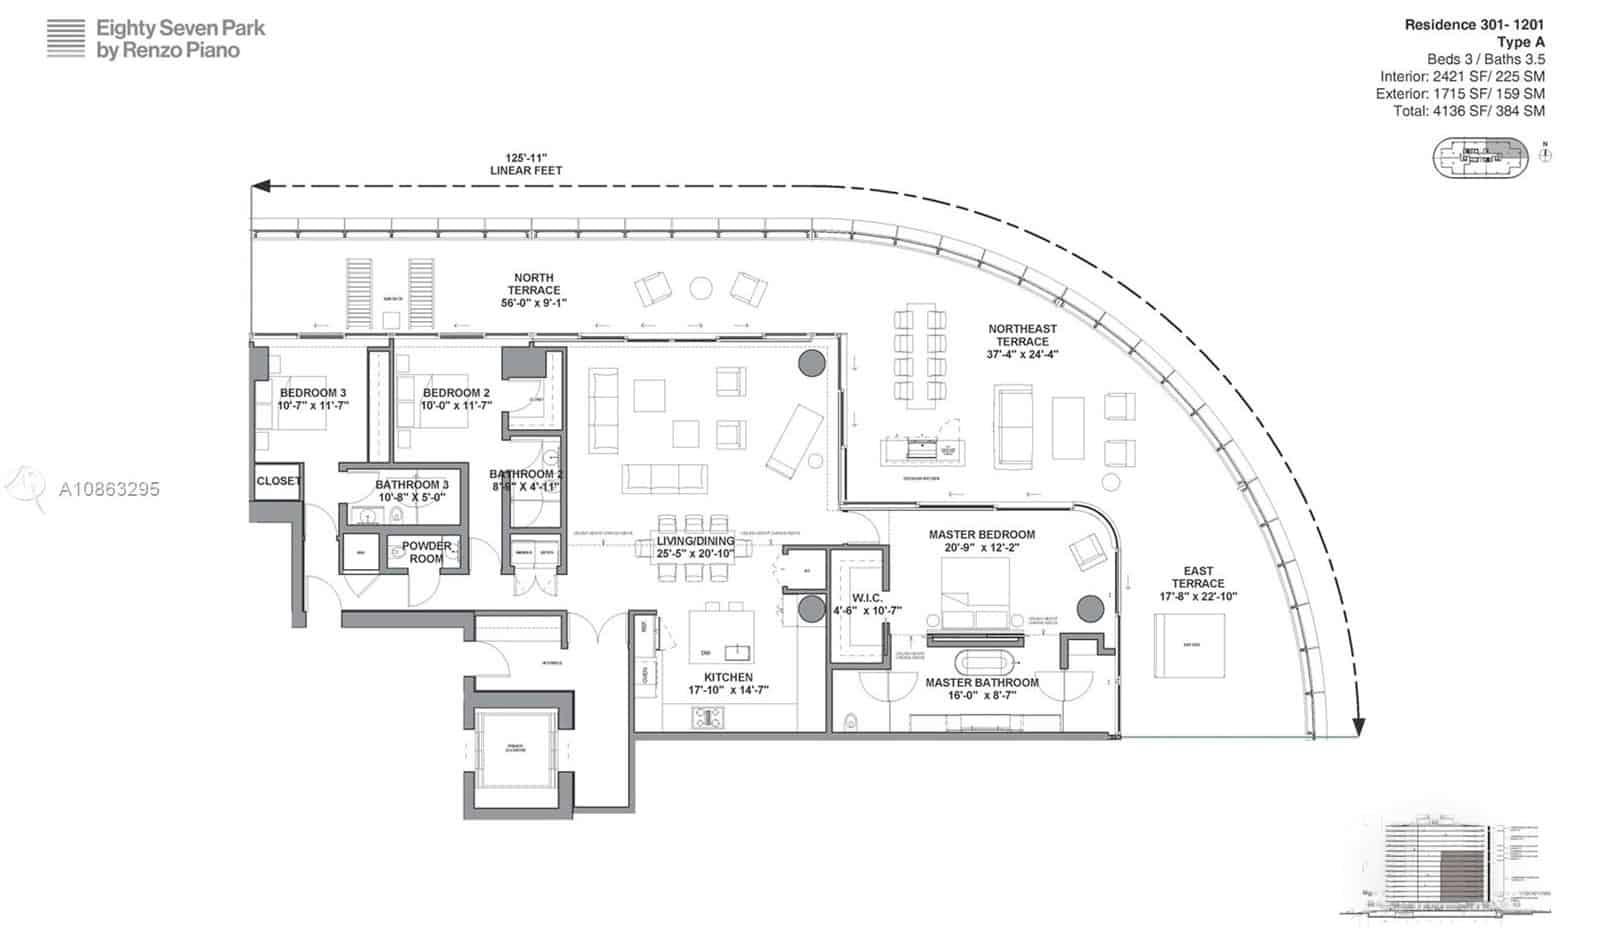 Eighty Seven Park: 8701 COLLINS AVE #601 Floor Plans